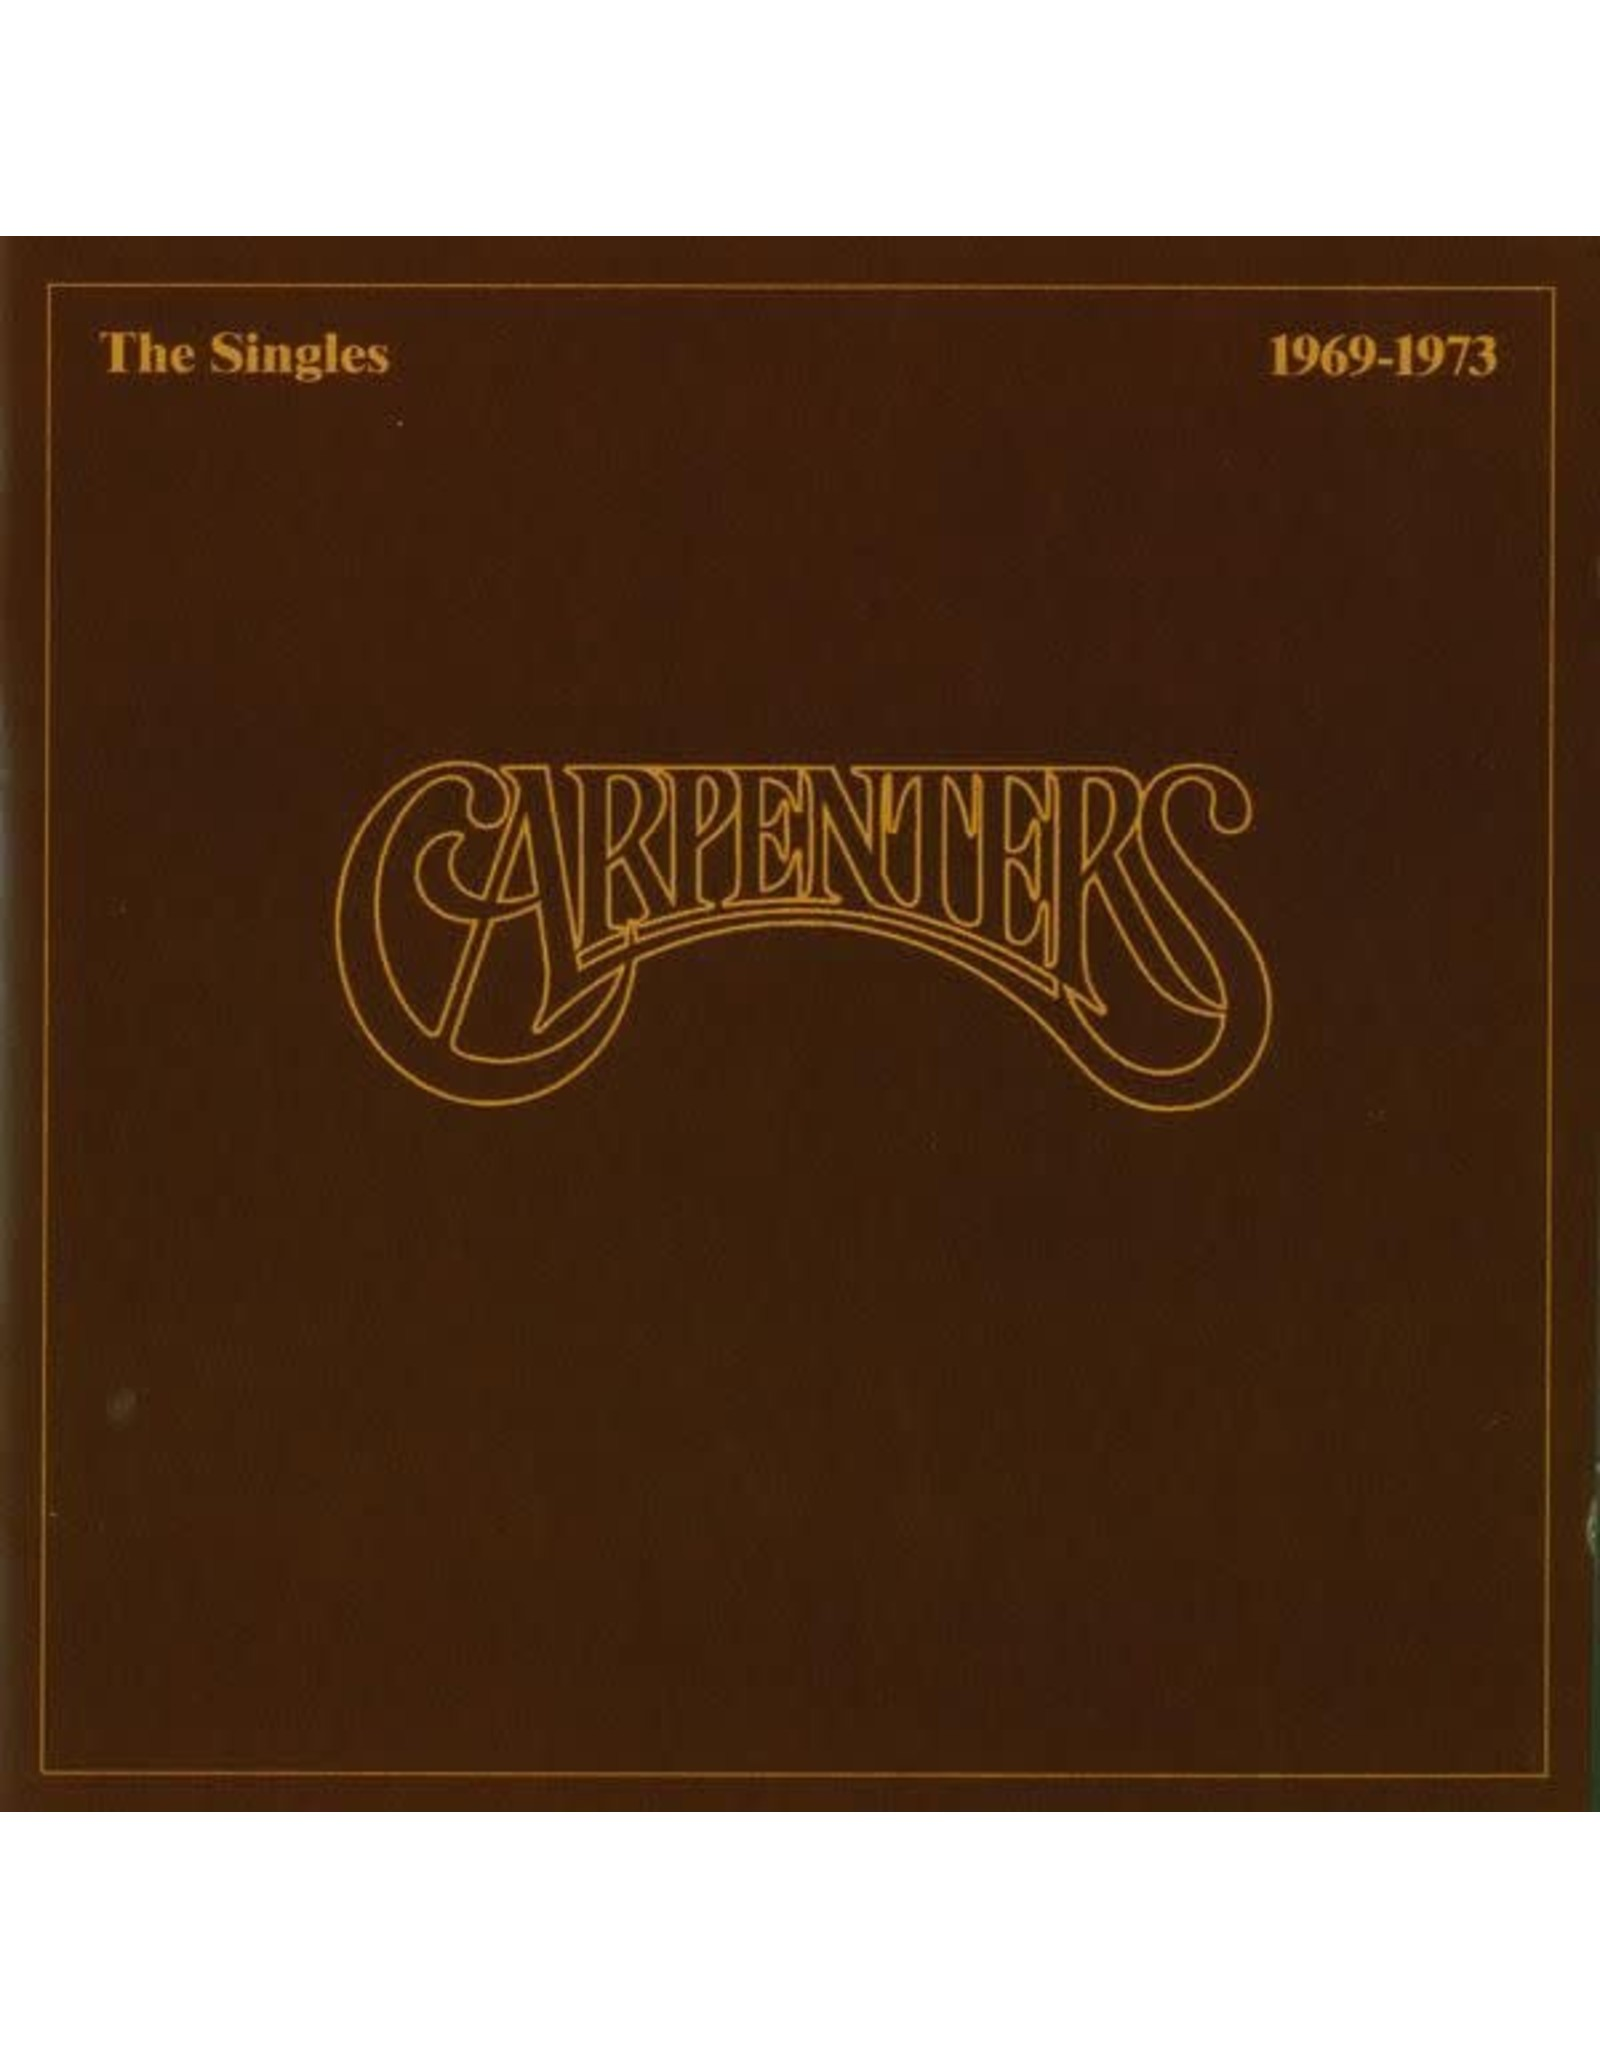 Carpenters - The Singles 1969-1973